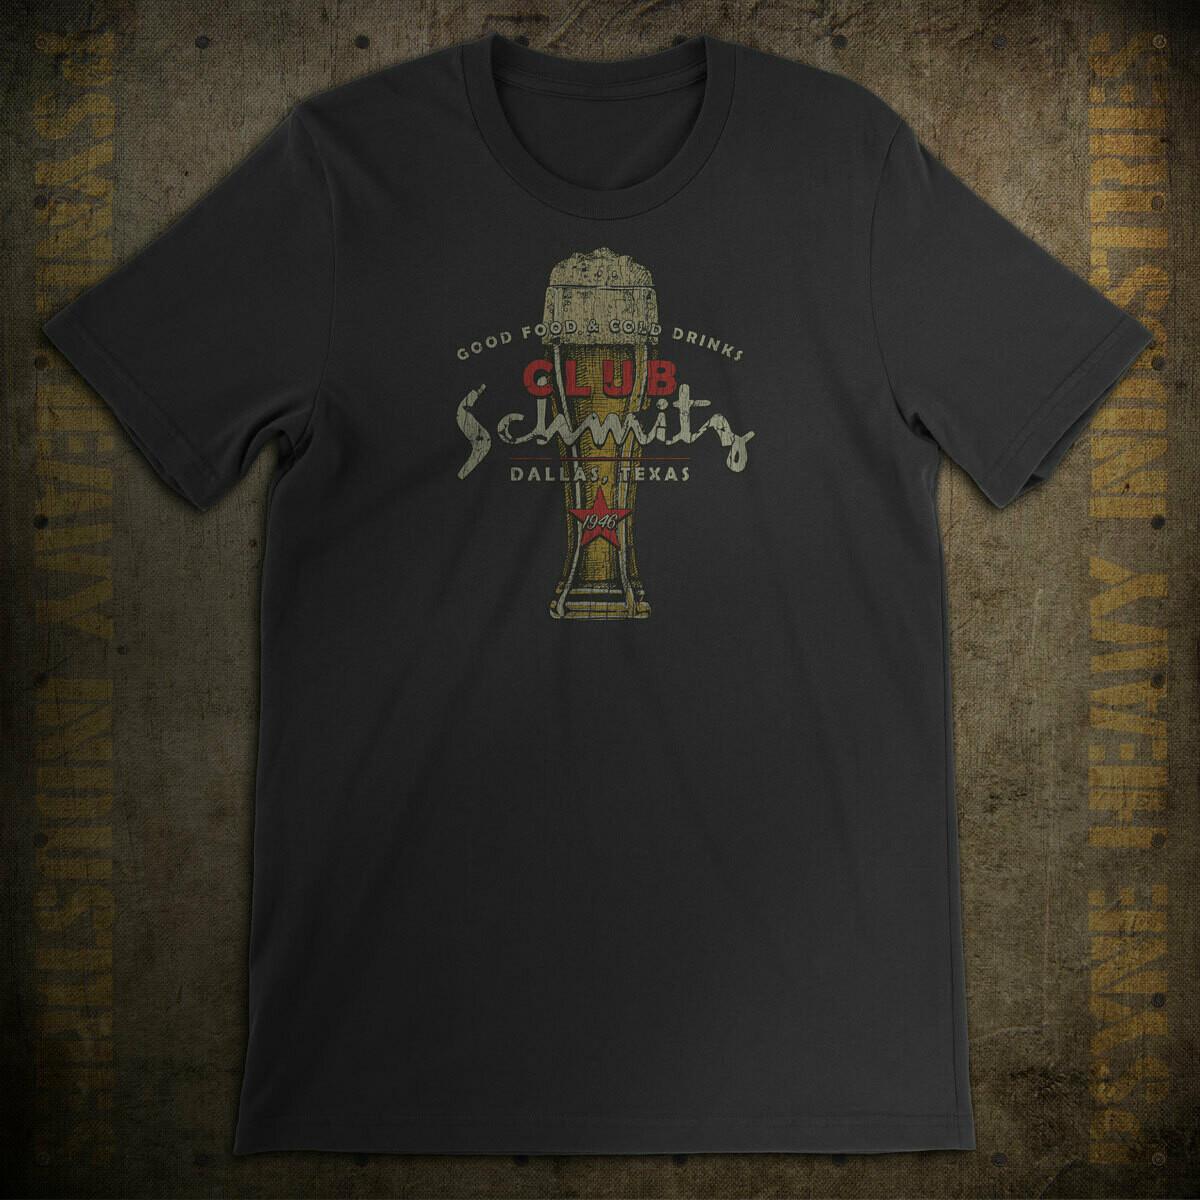 Club Schmitz Vintage Dallas, Texas Dive Bar T-Shirt